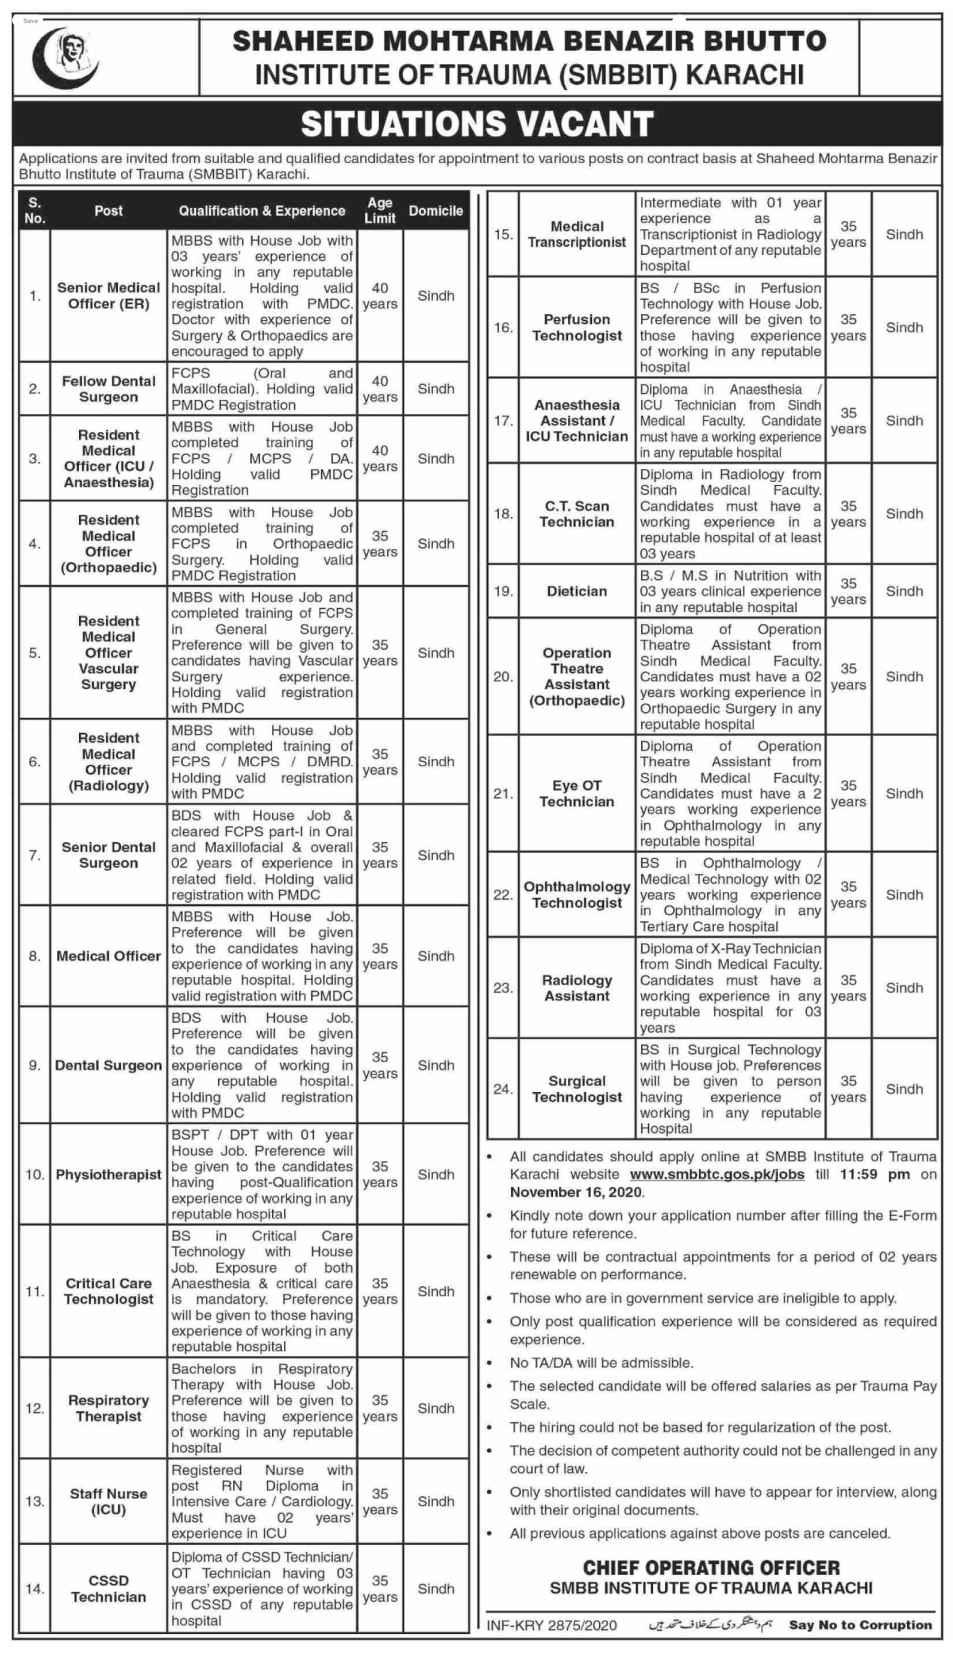 Shaheed Mohtarma Benazir Bhutto Institute of Trauma SMBBIT Medical Posts Karachi 2020